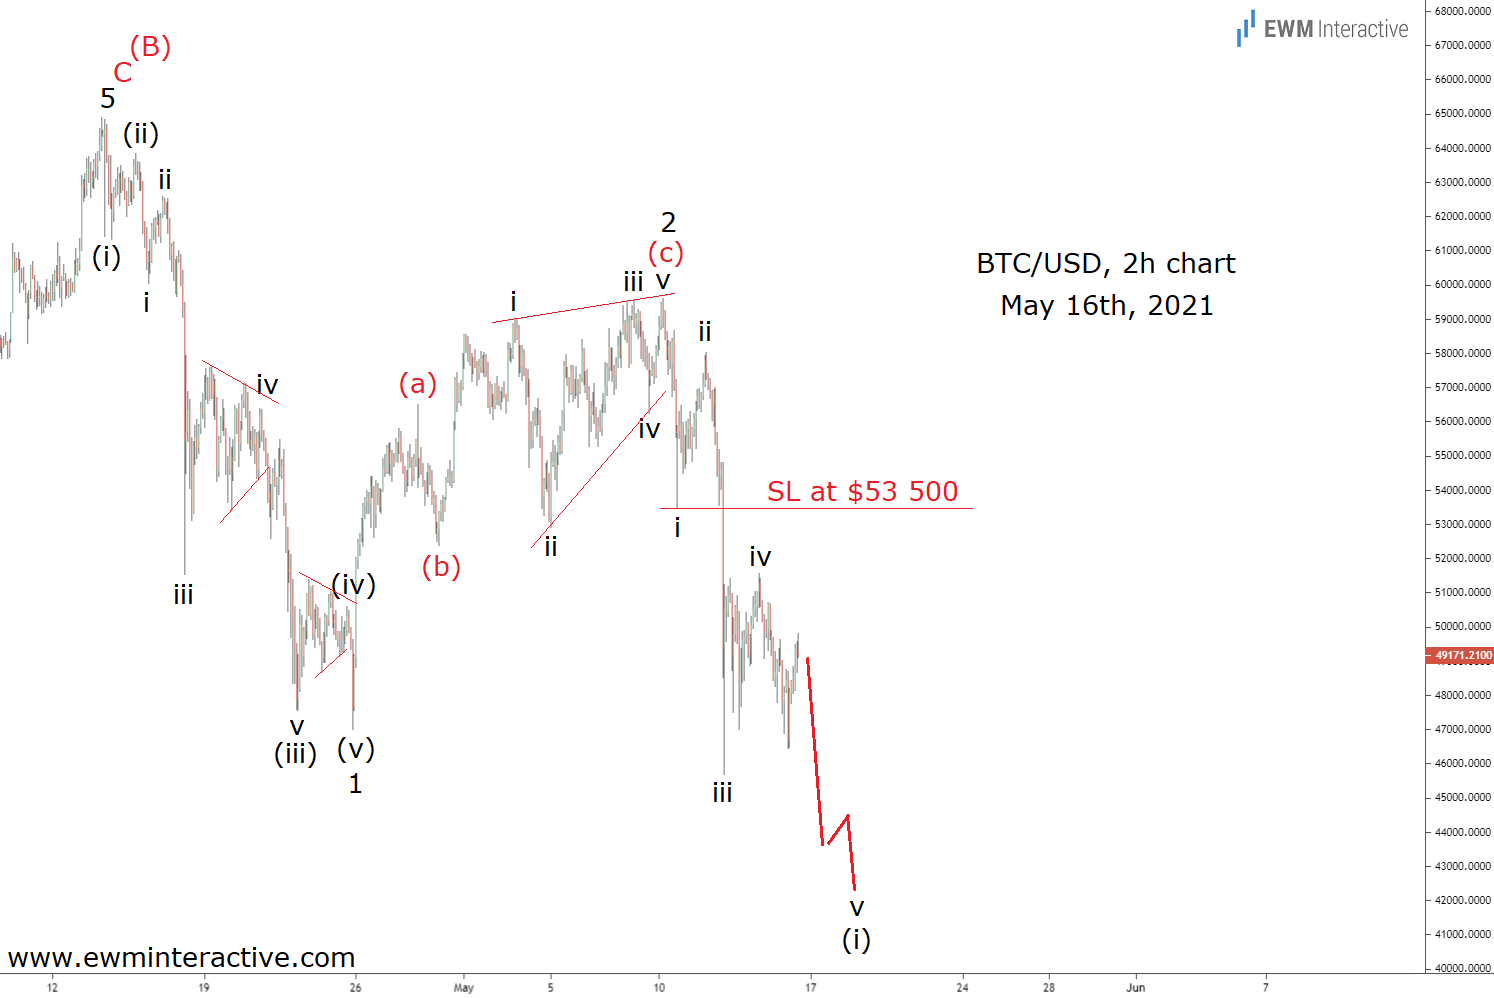 BTC/USD 2-Hr Chart - May 16th, 2021